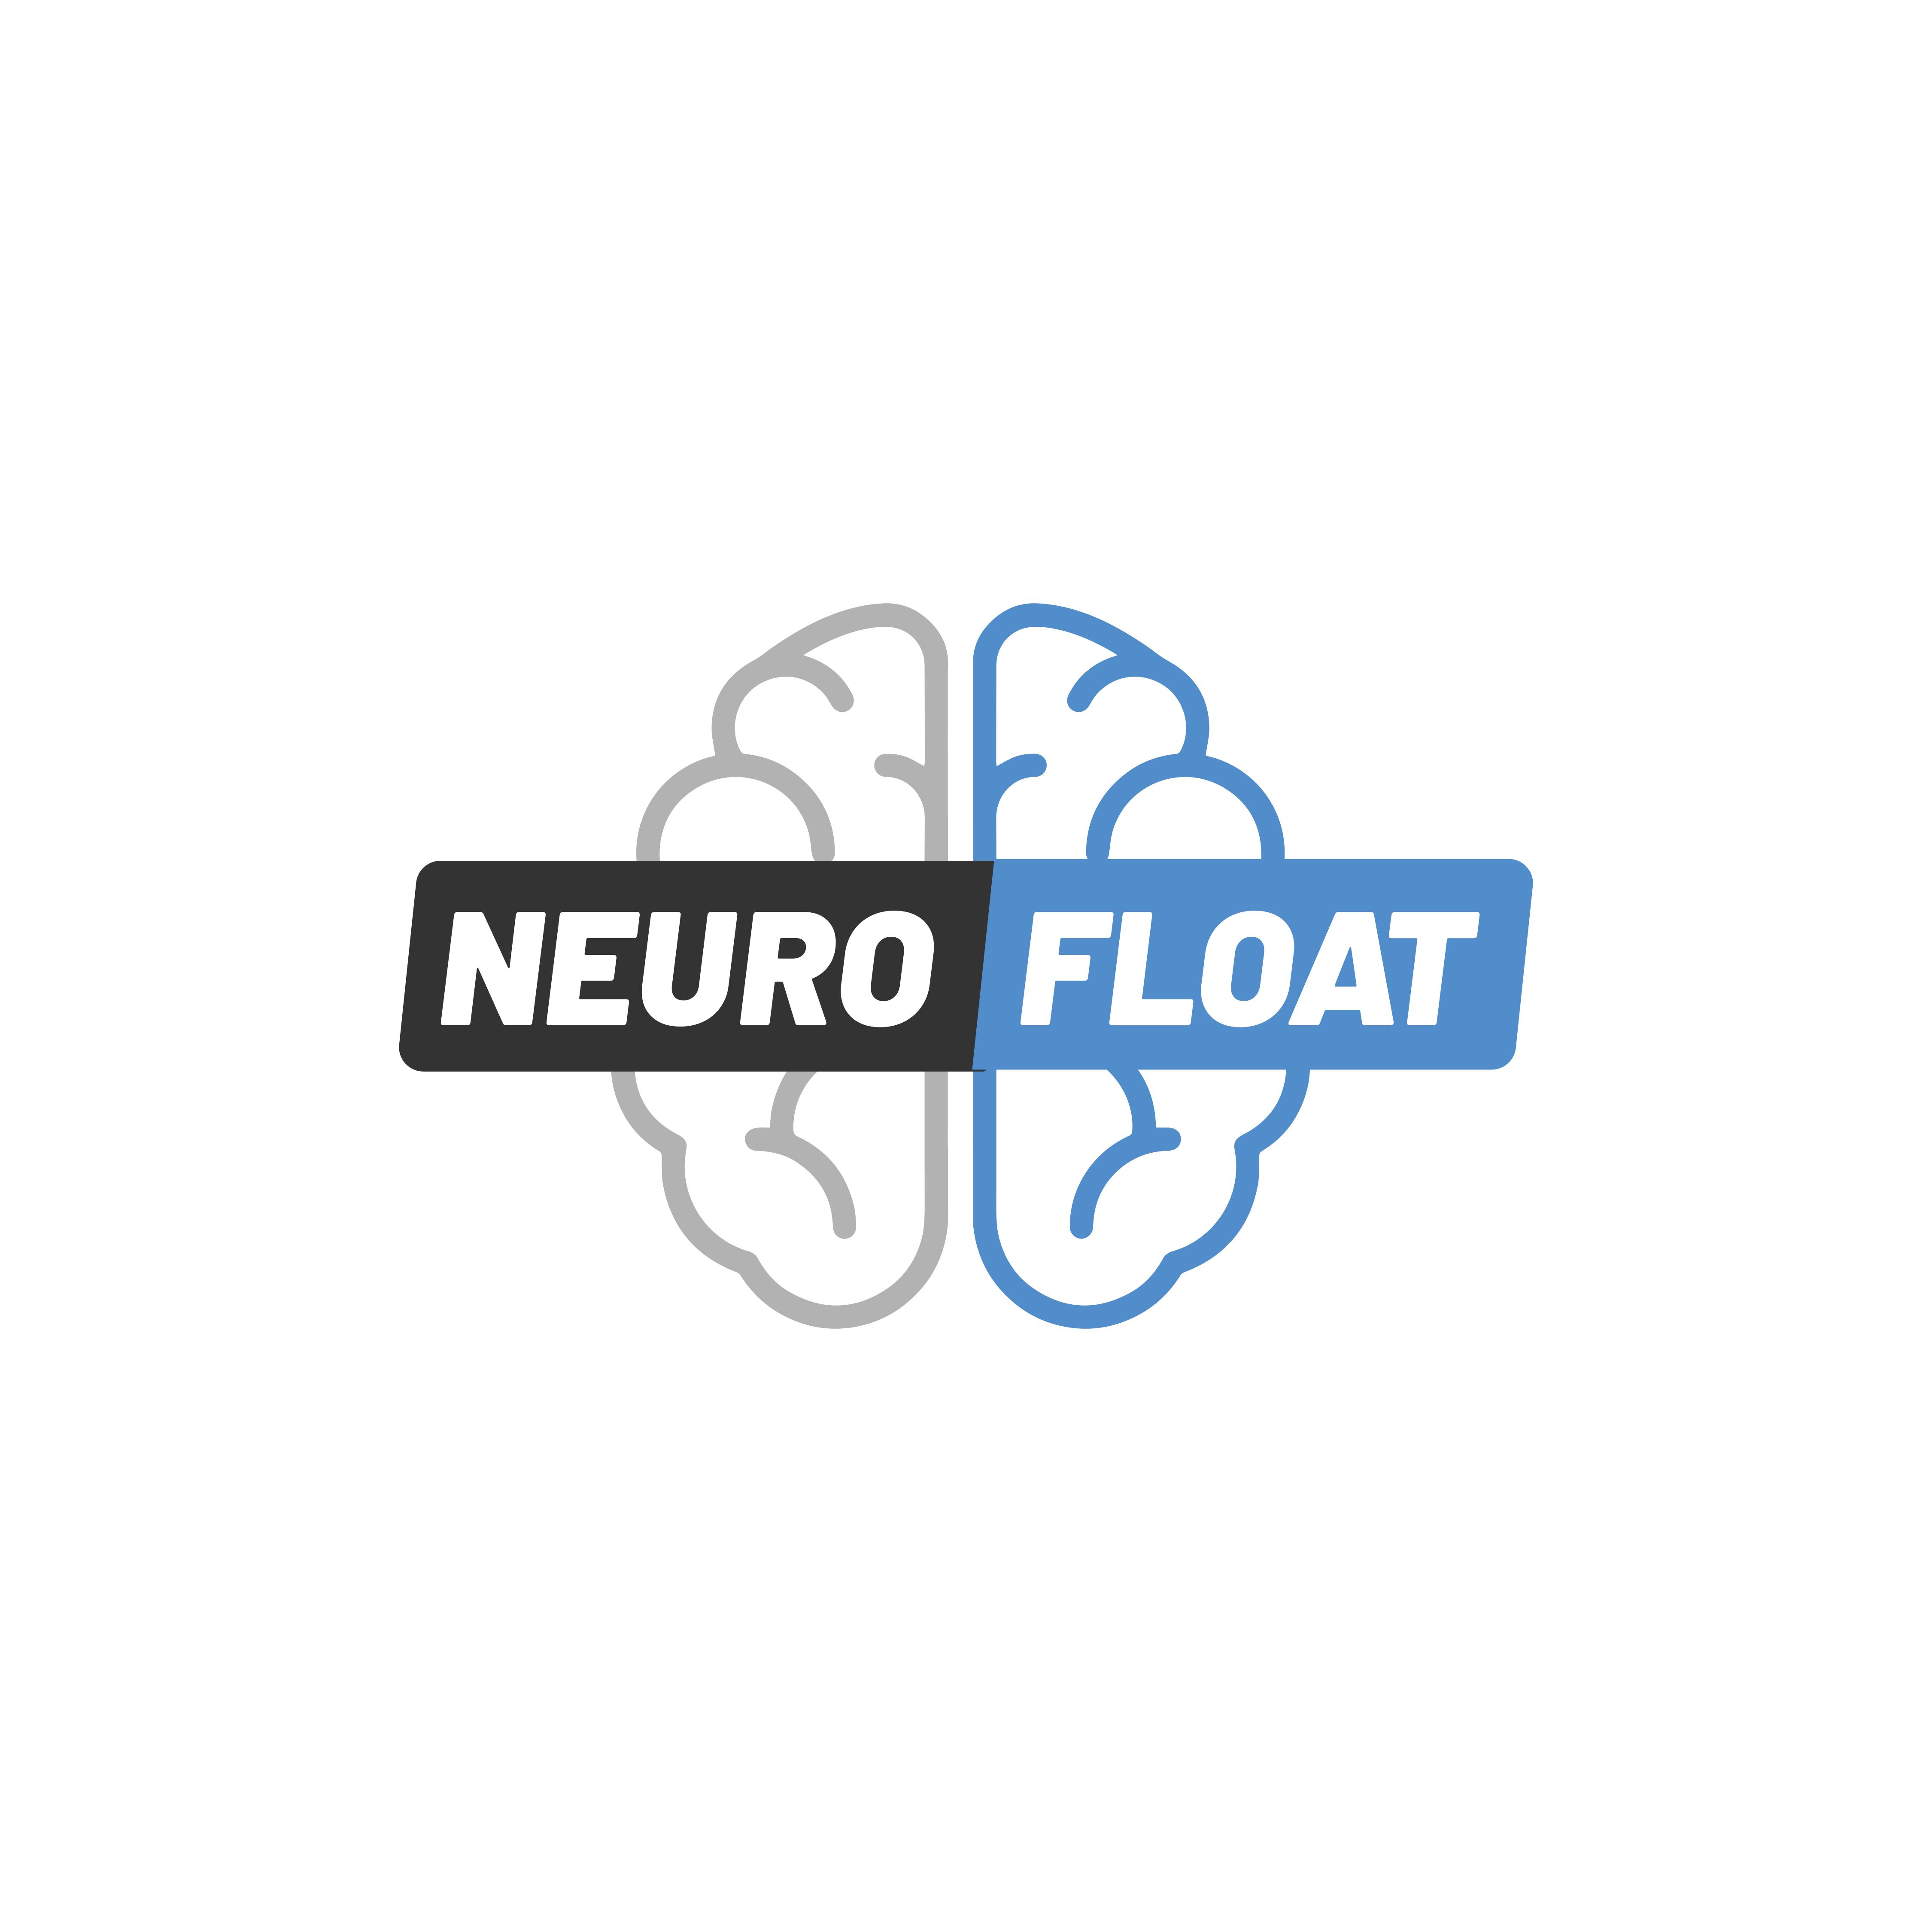 Athlete Float